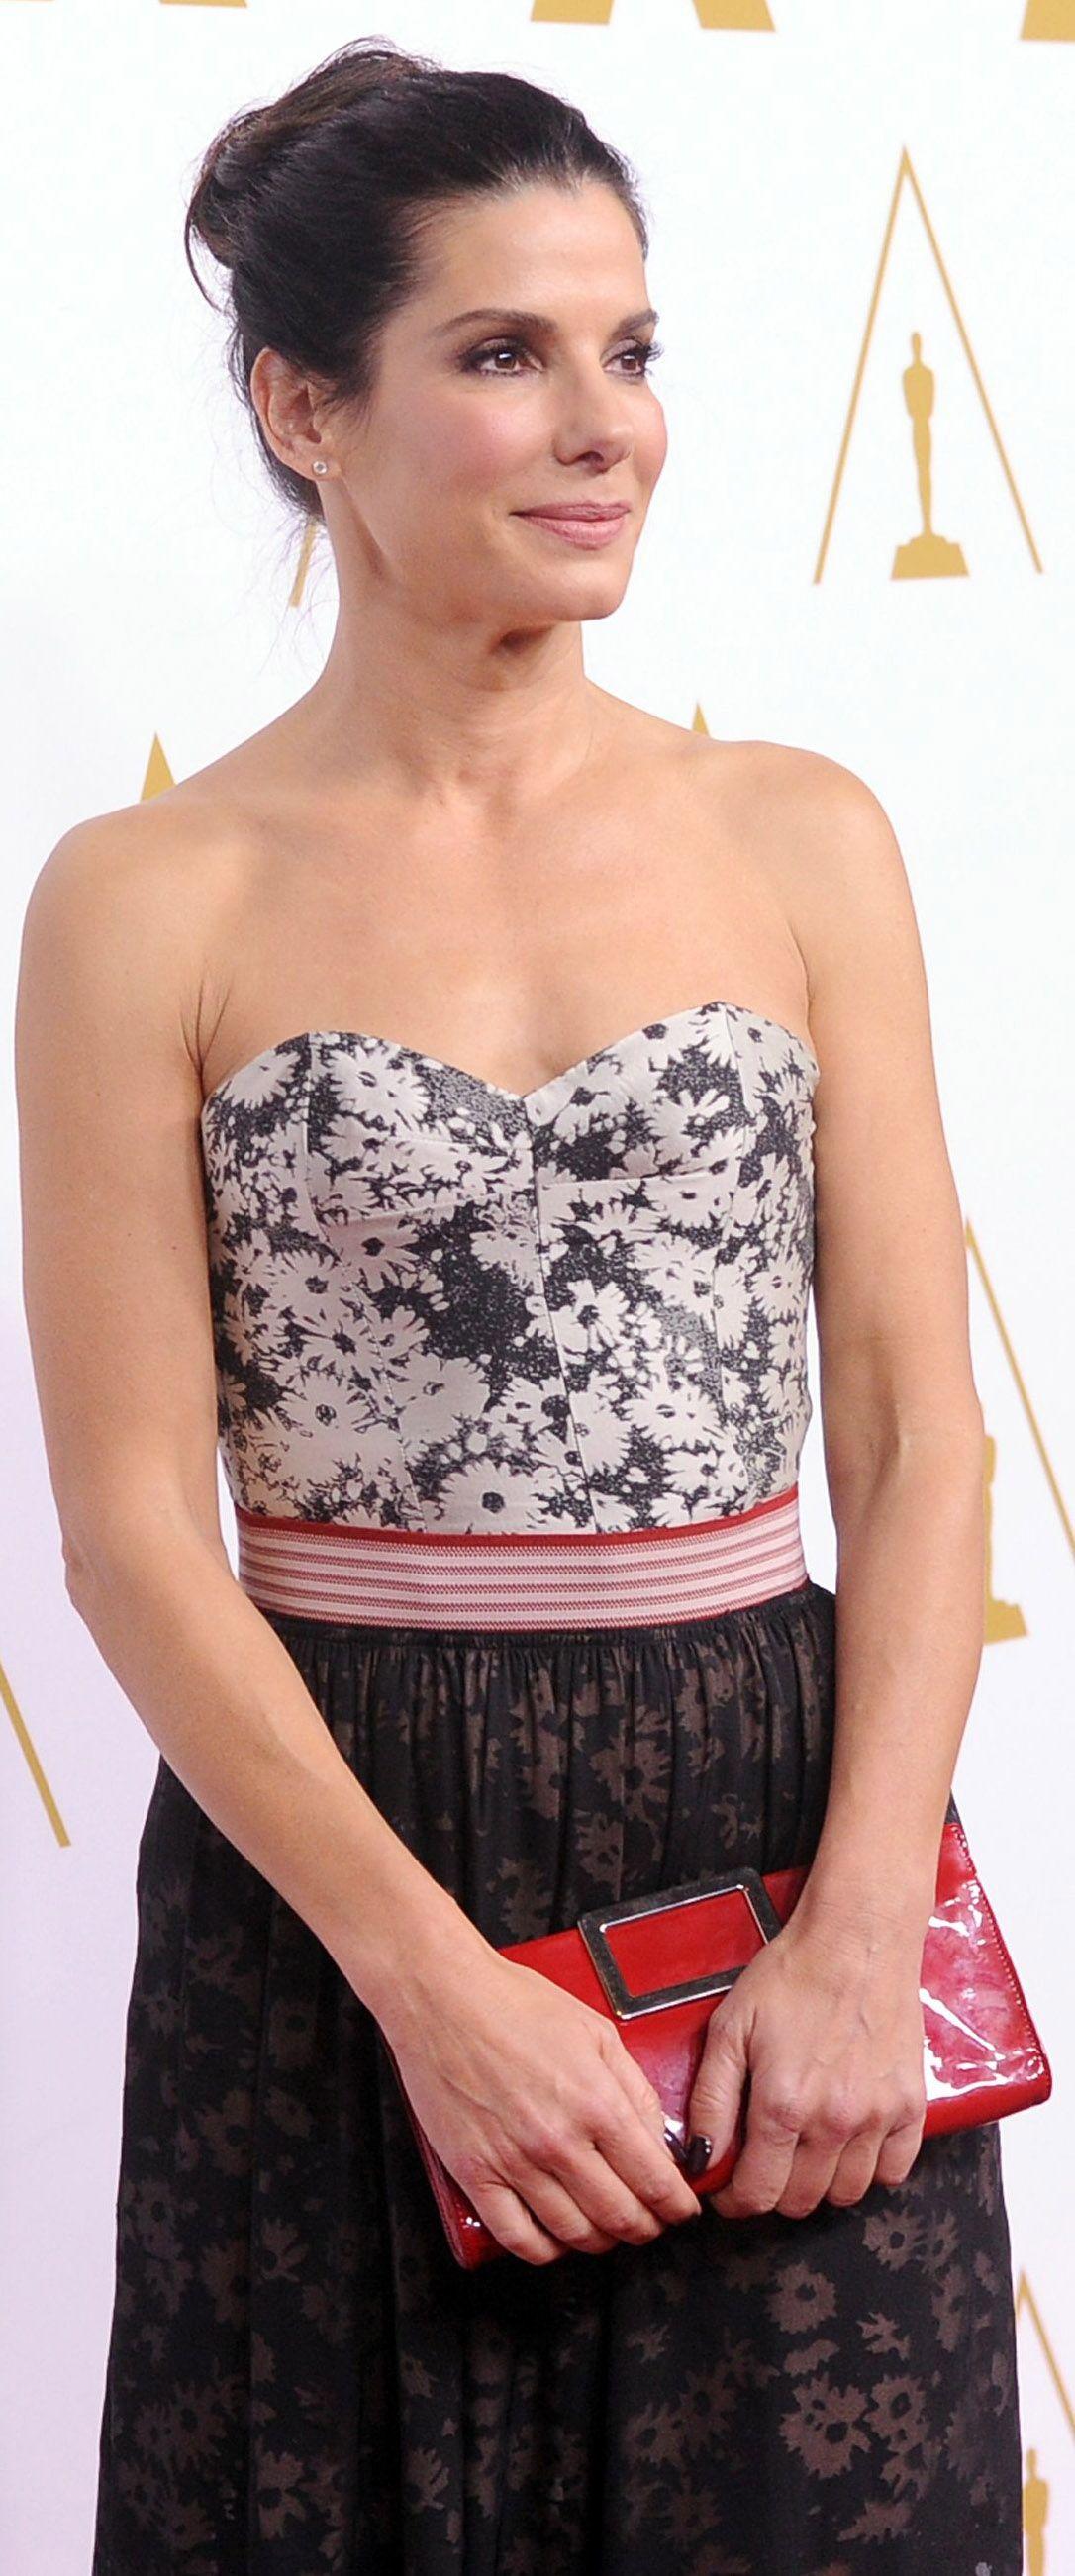 Pin on ♡Sandra Bullock♡ Favorite Actress